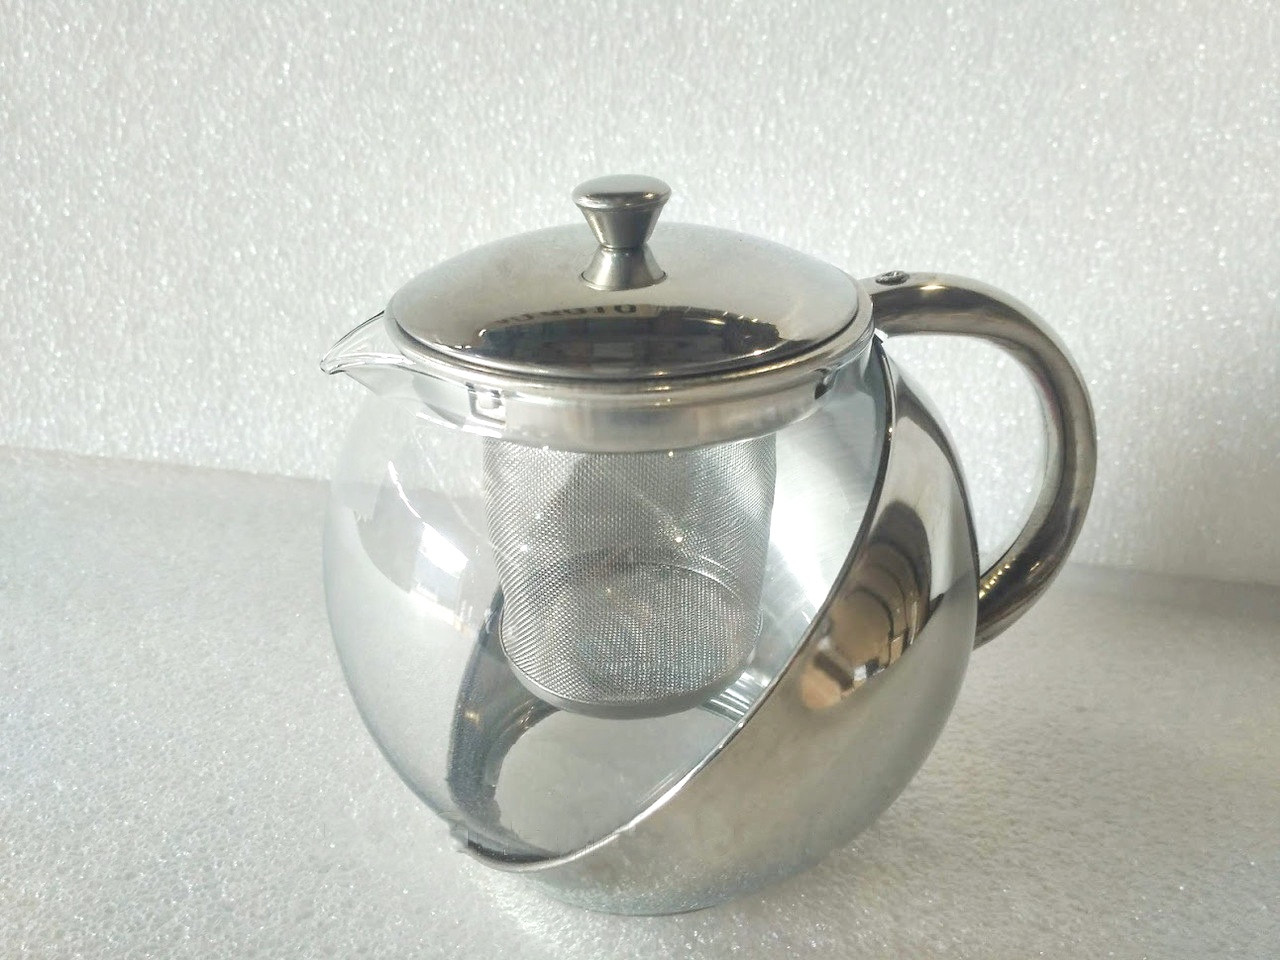 Заварочный чайник Rainstahl RS 7201-75 750мл